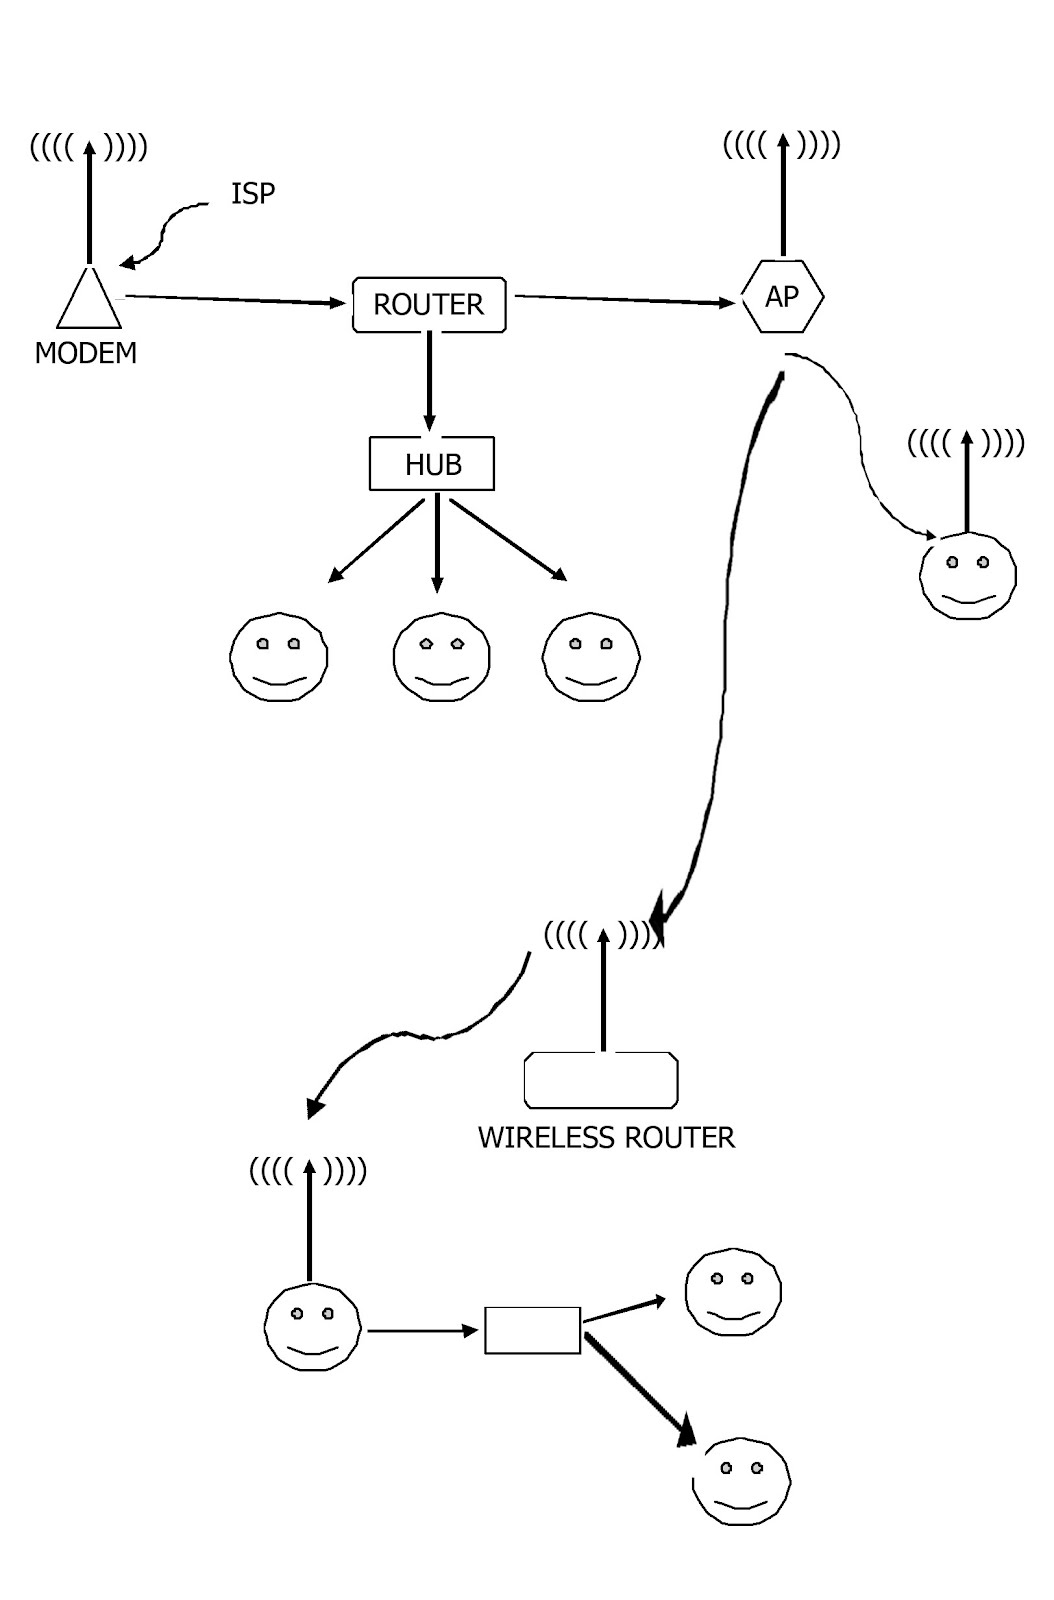 Iptek Modem Wireless Router Hub Dan Access Point